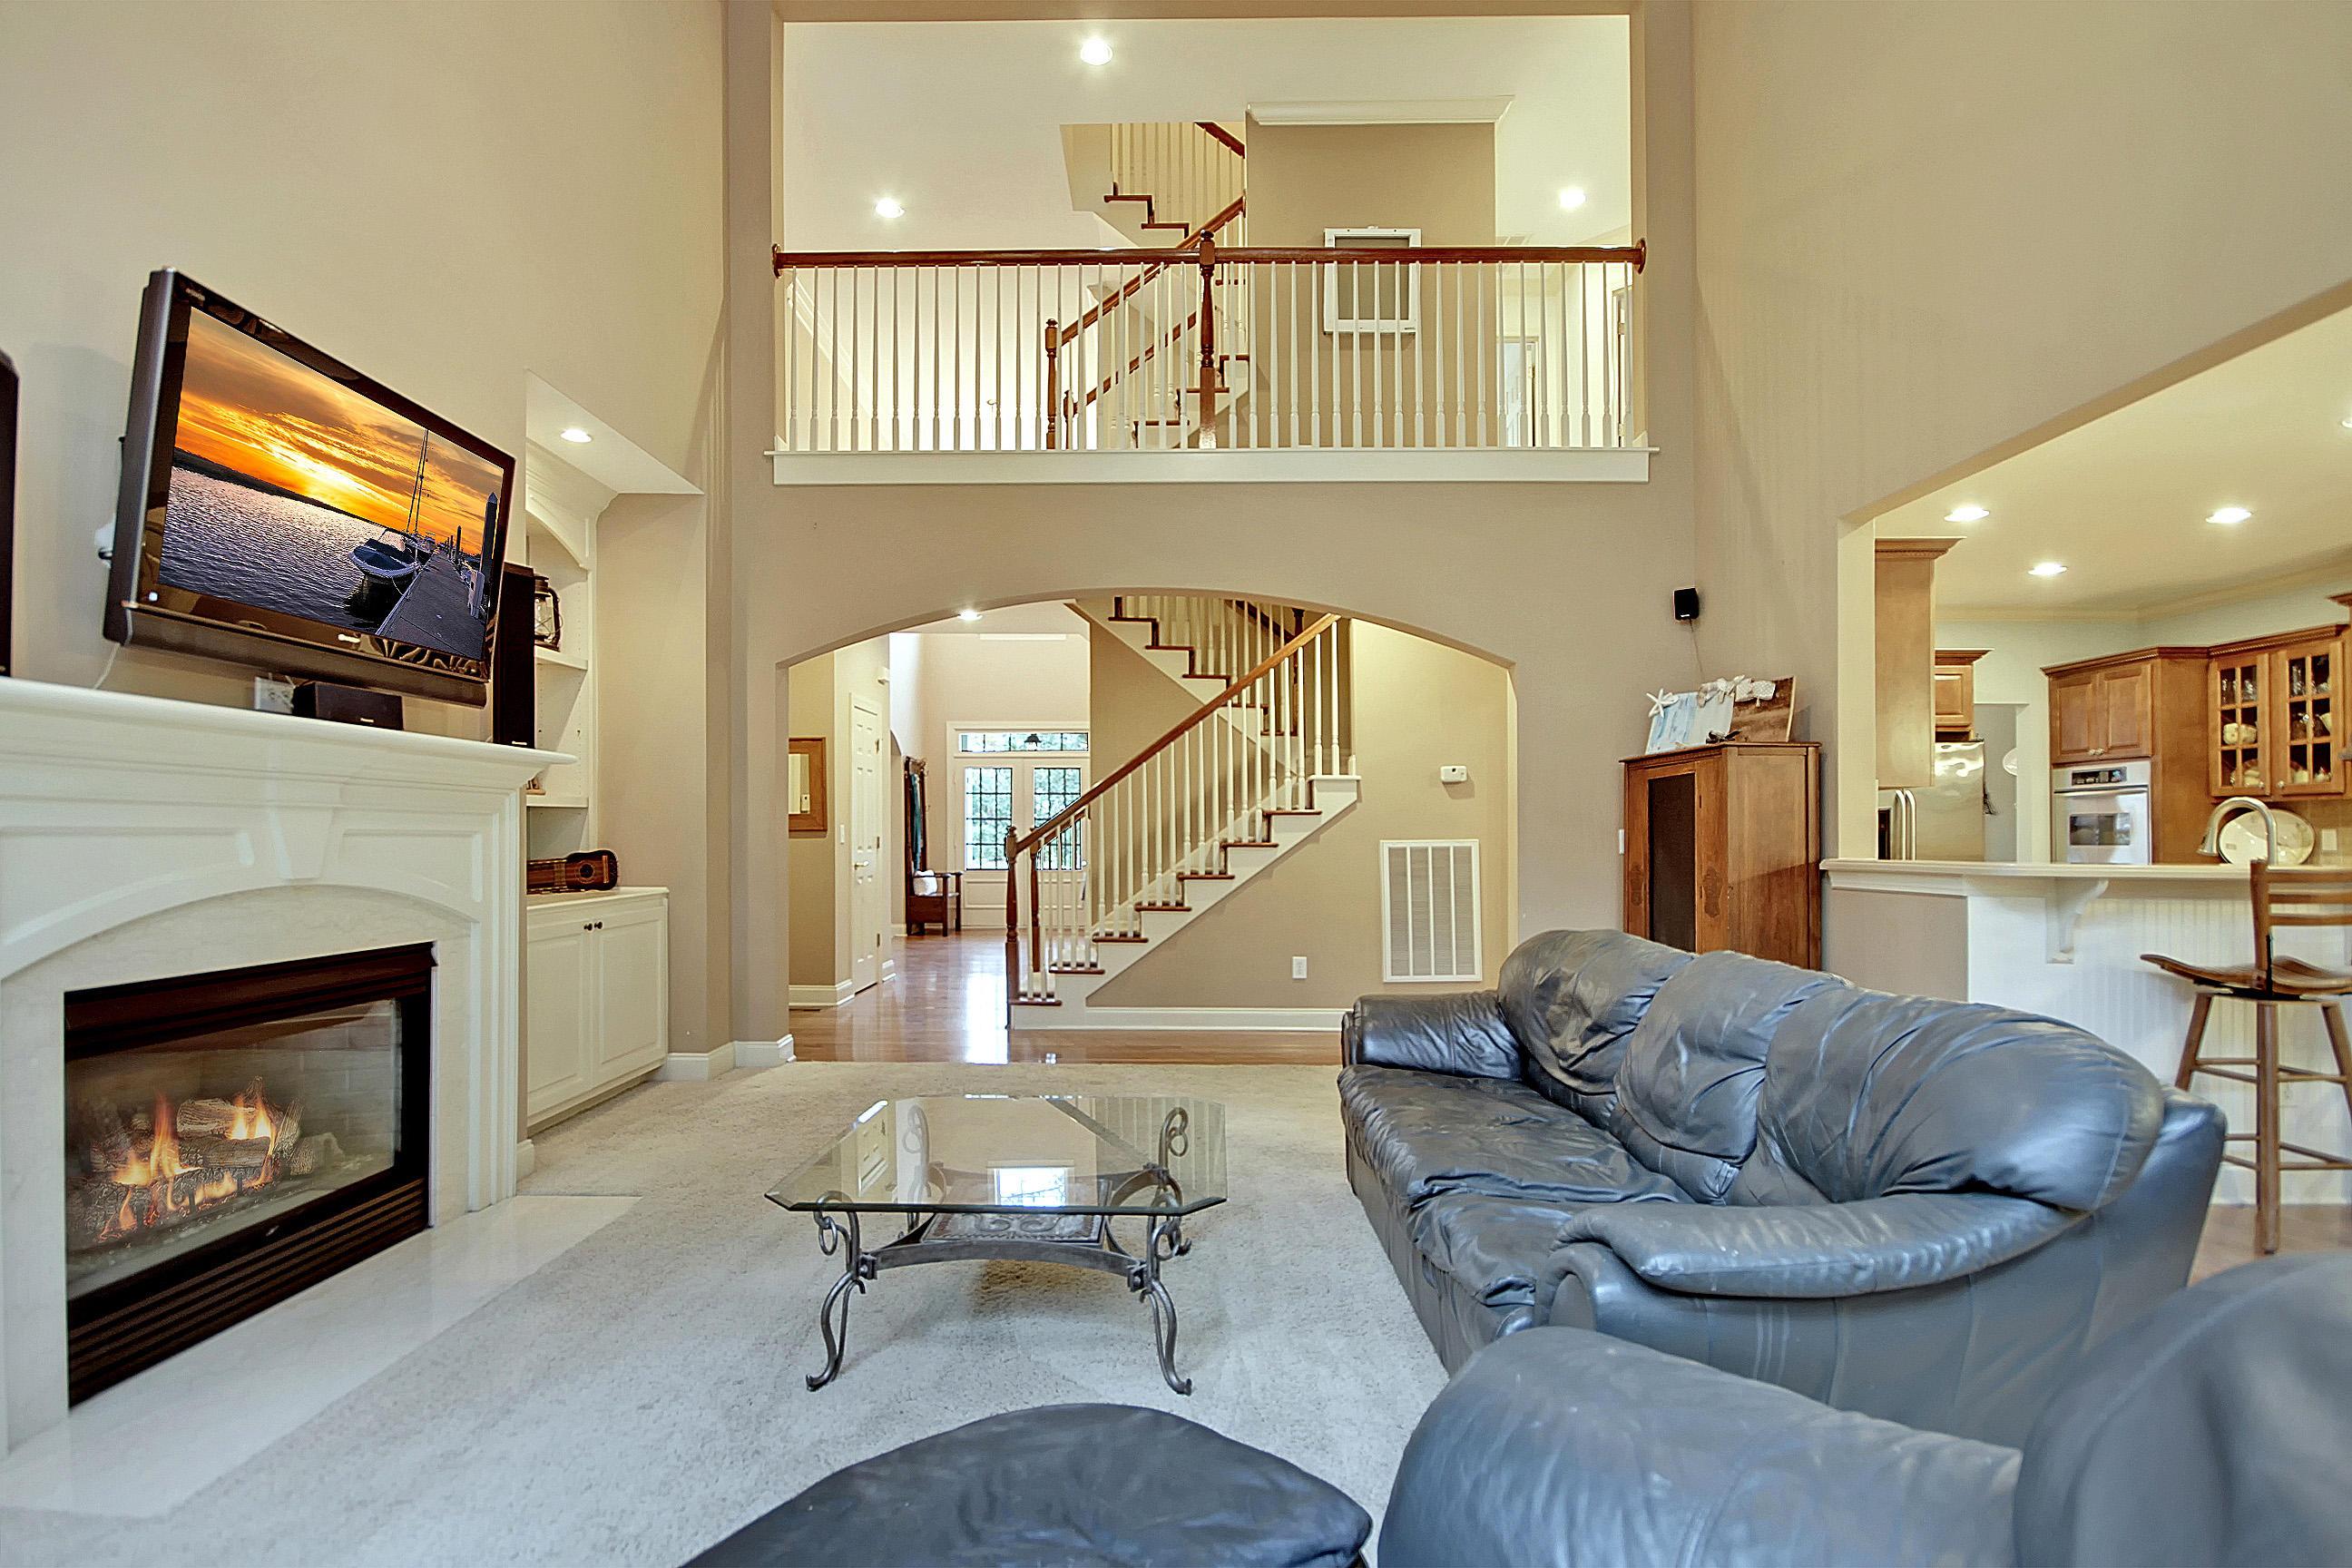 Dunes West Homes For Sale - 2449 Darts Cove, Mount Pleasant, SC - 1